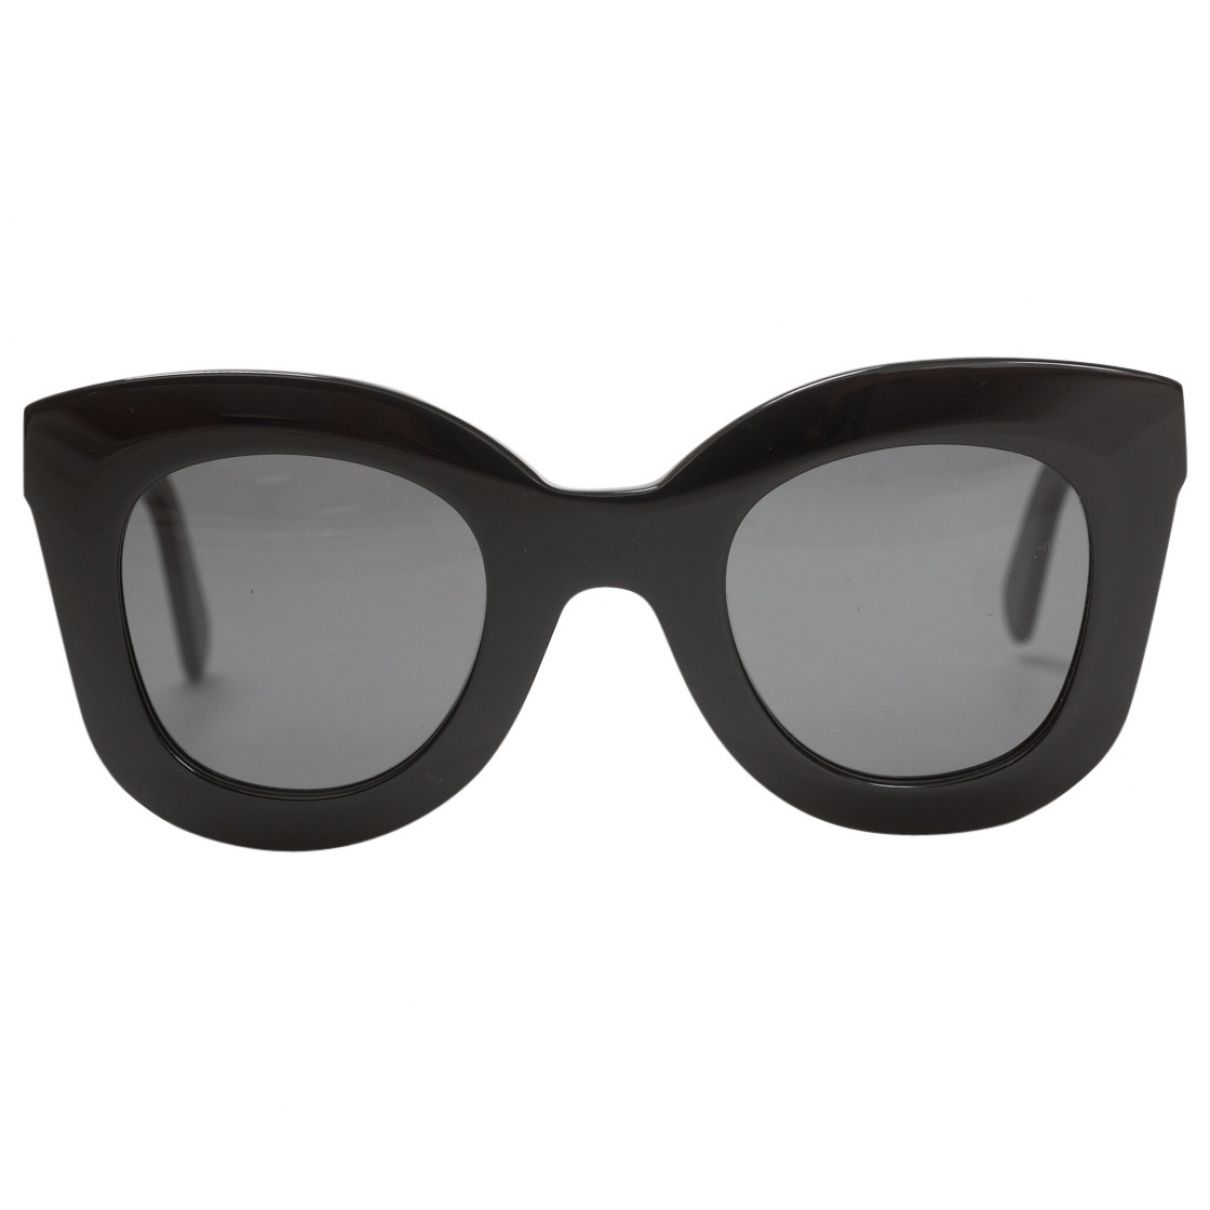 6c9f524300a Céline Black Sunglasses